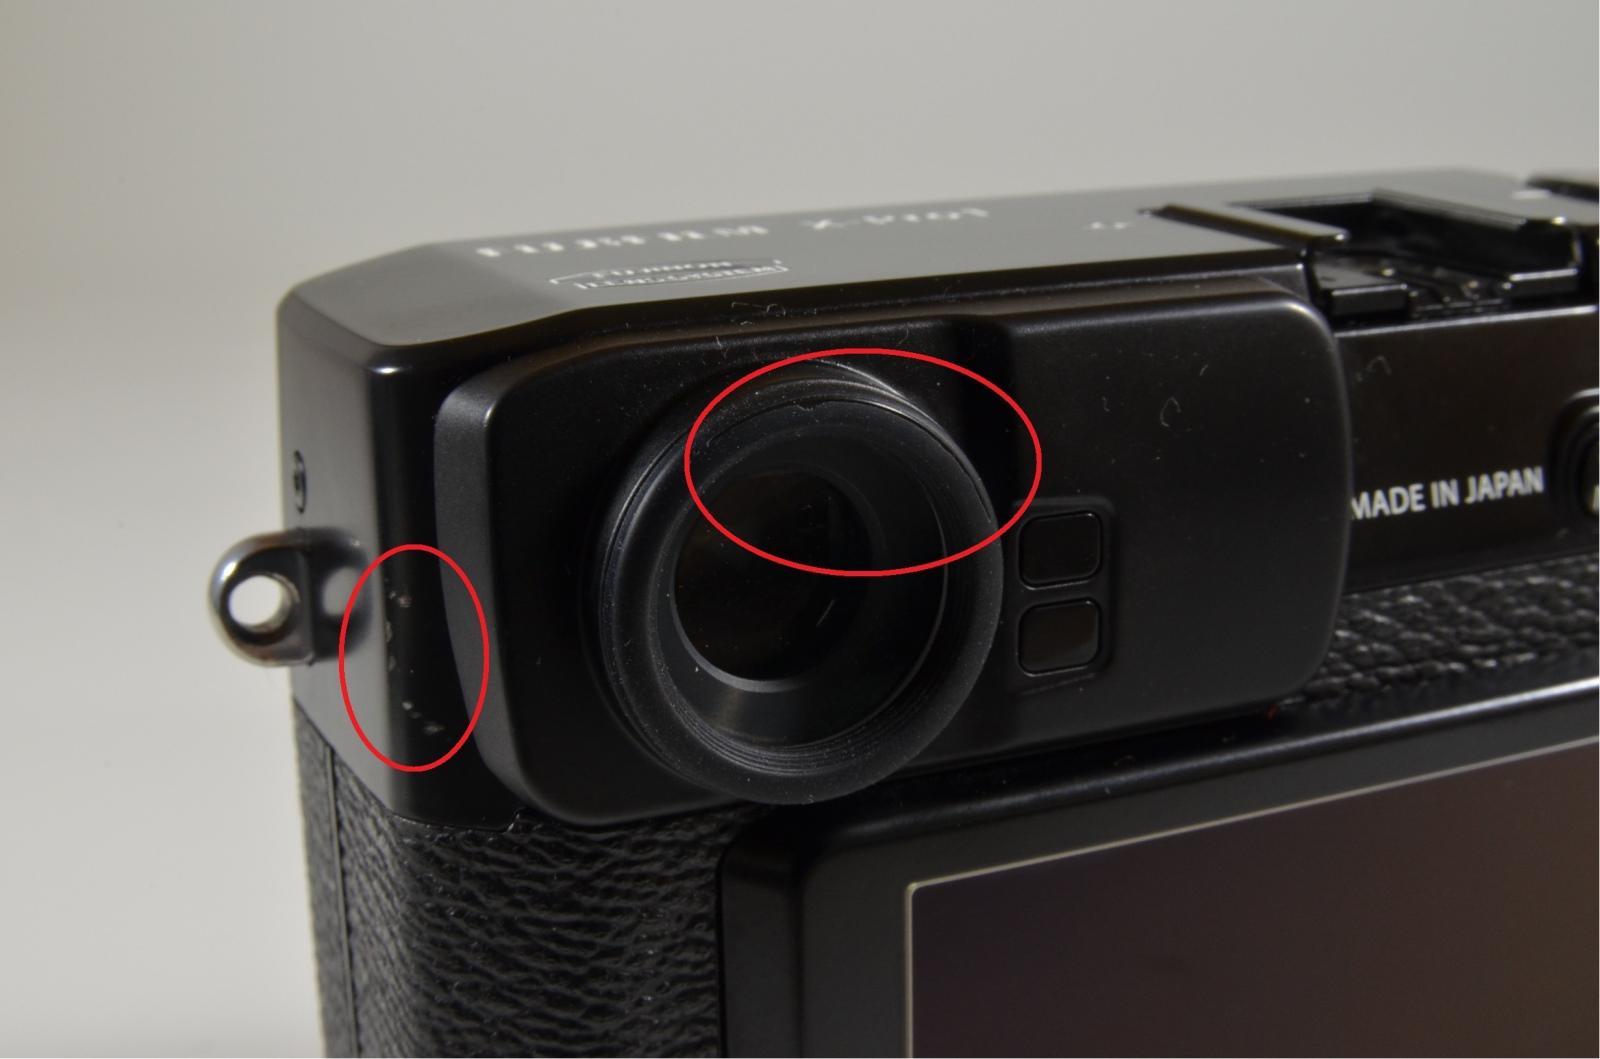 fujifilm x-pro1 xf35mm f1.4 r digital camera